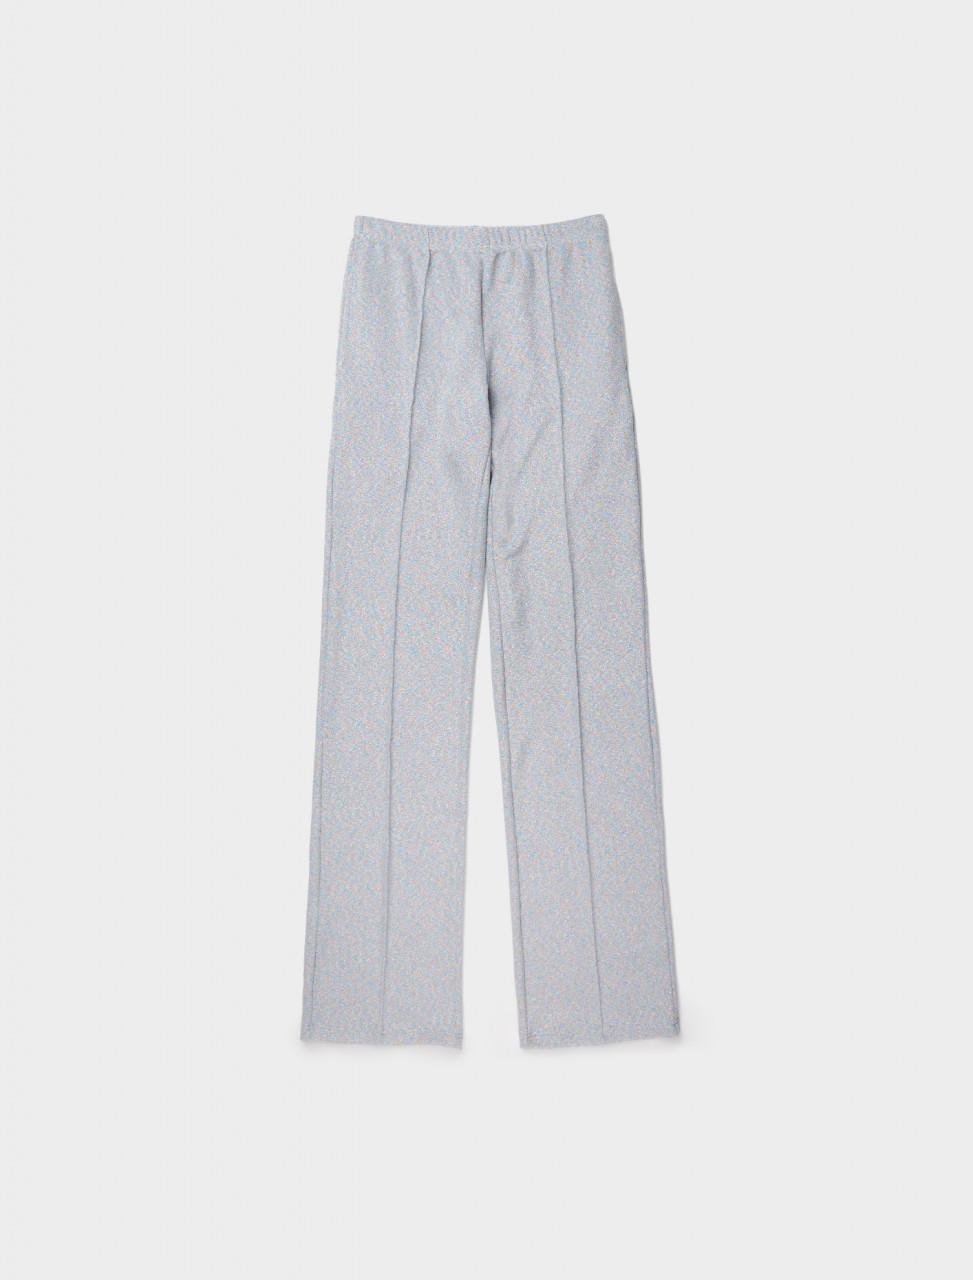 330-LSFW20-06 LAZOSCHMIDL ROSS LOUNGE PANTS